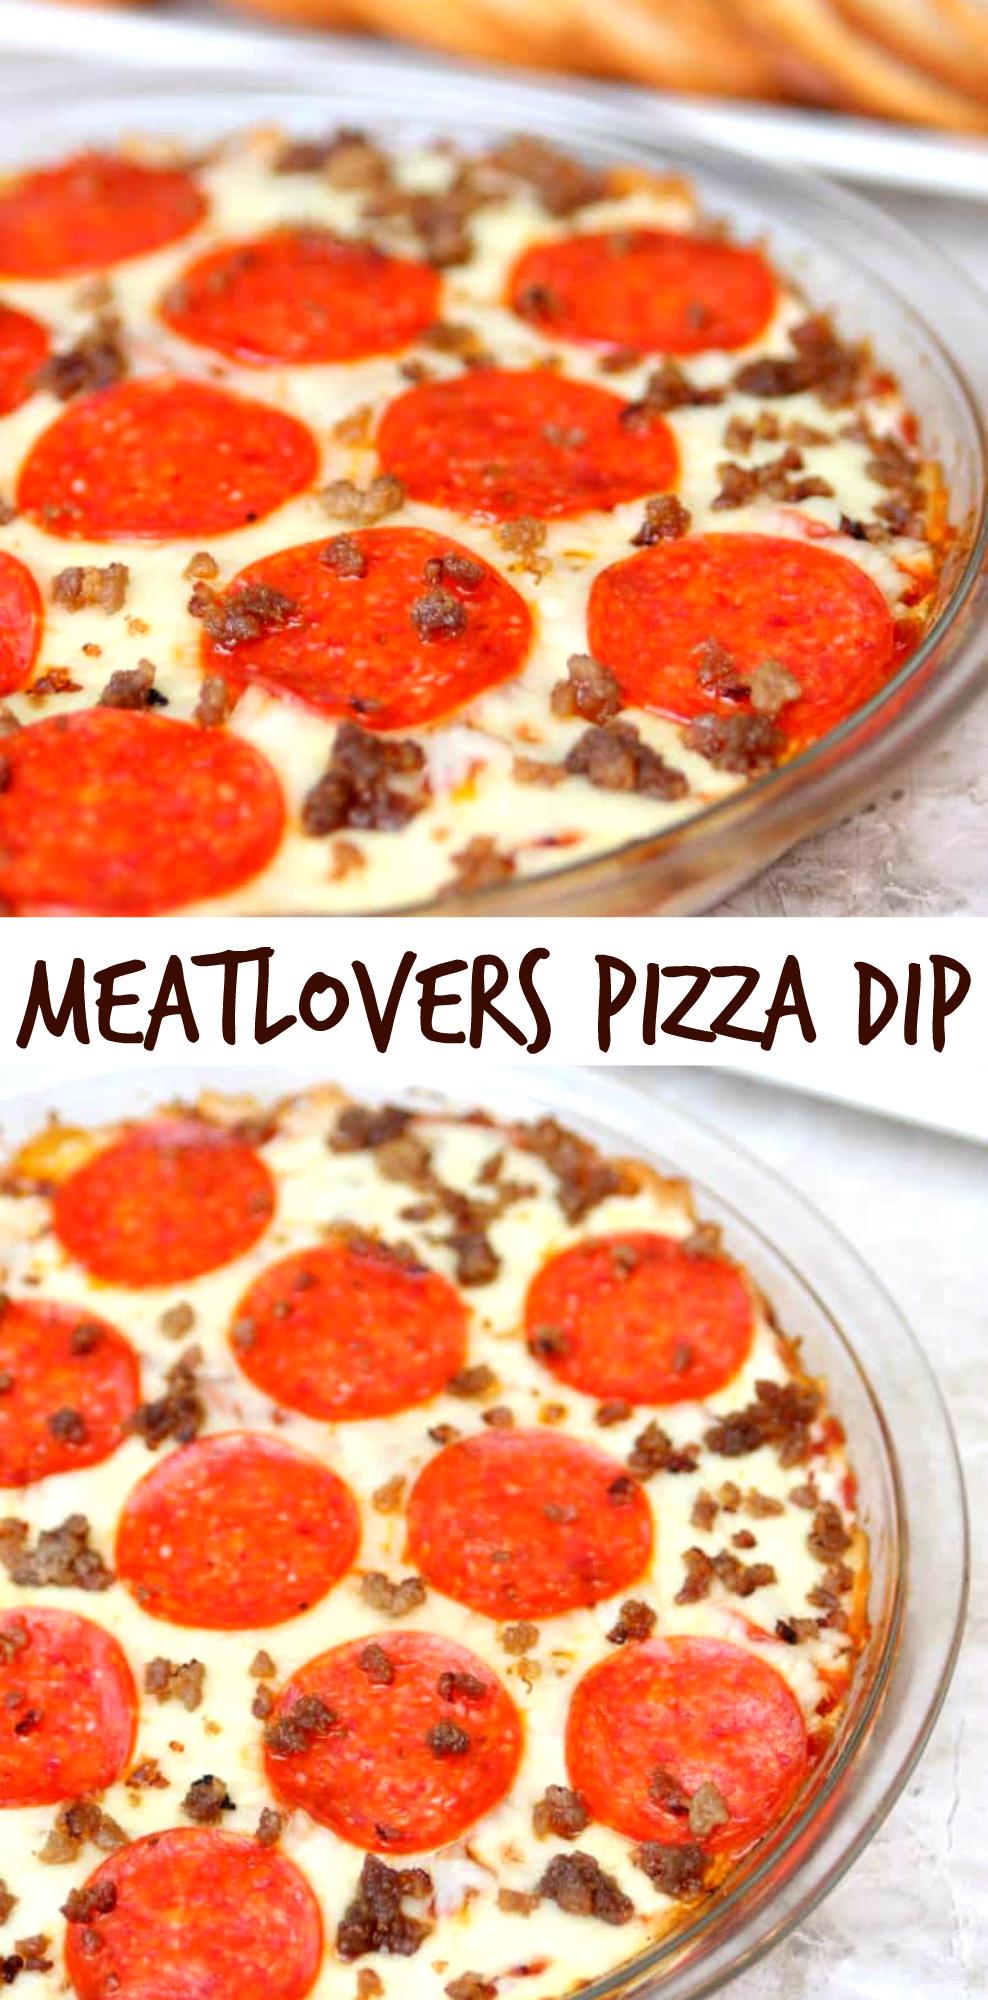 Meatlovers Pizza Dip Rezept Favorite Recipes Pinterest